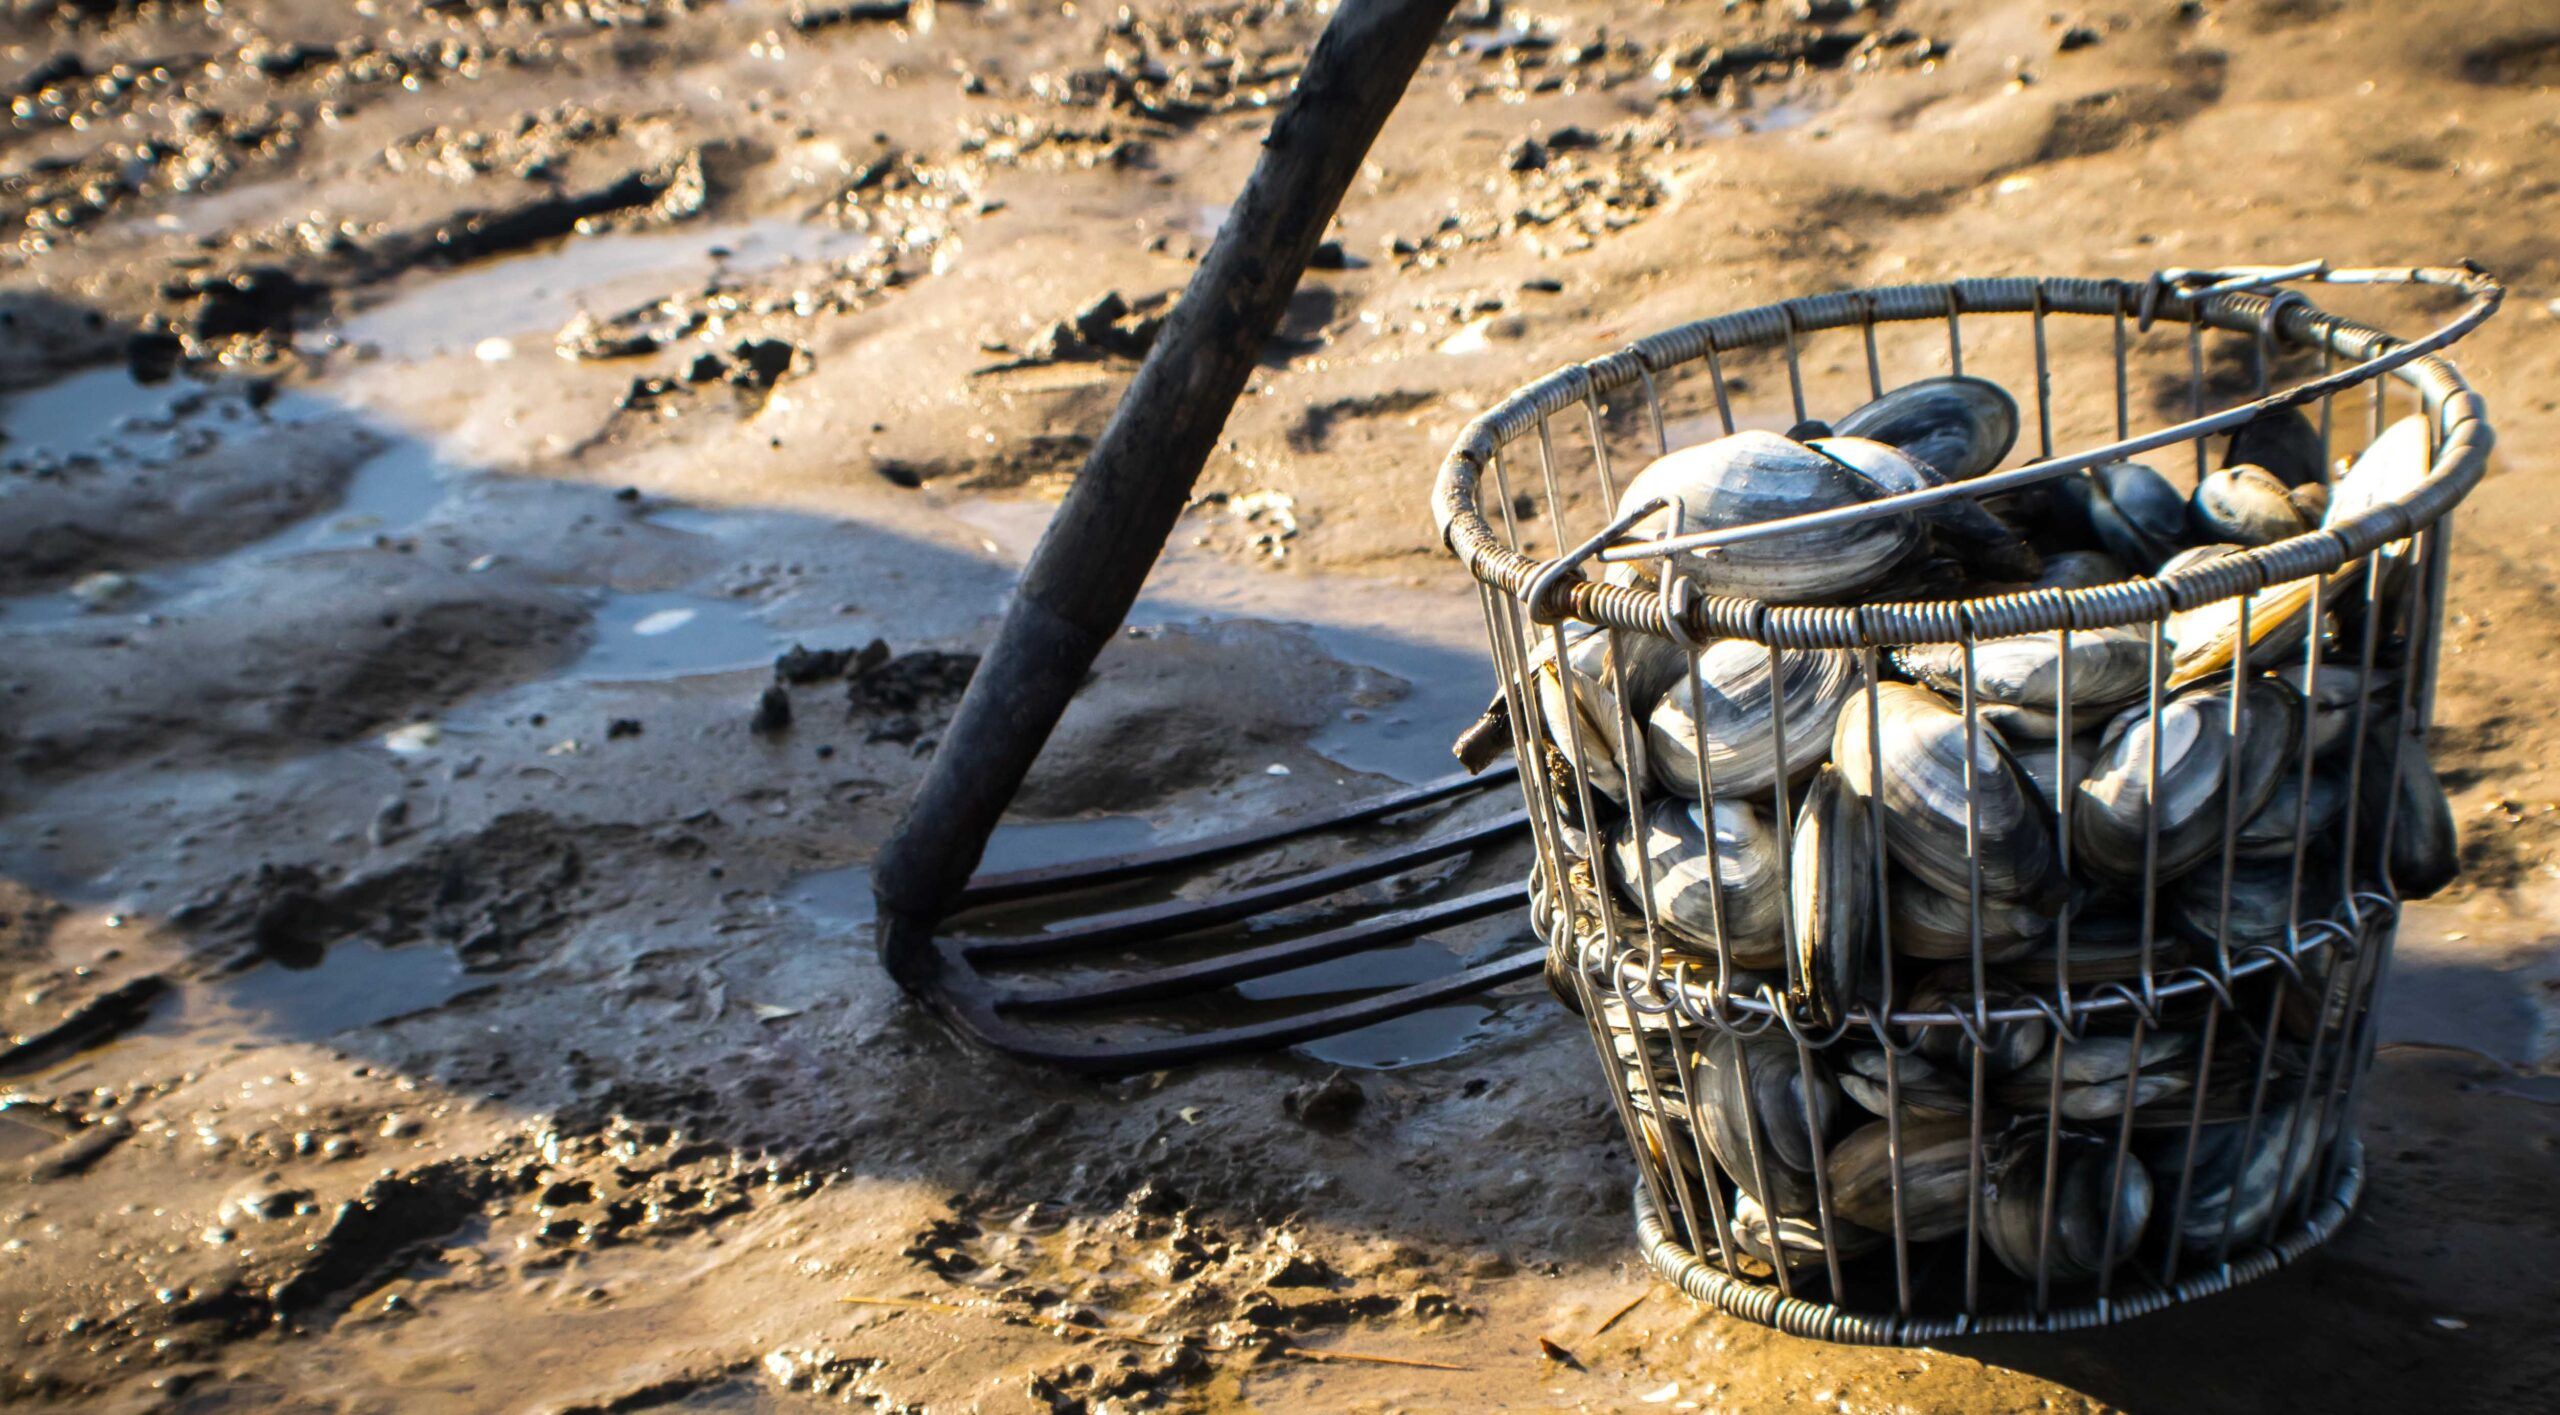 Maine clamflat, rake, basket with clams